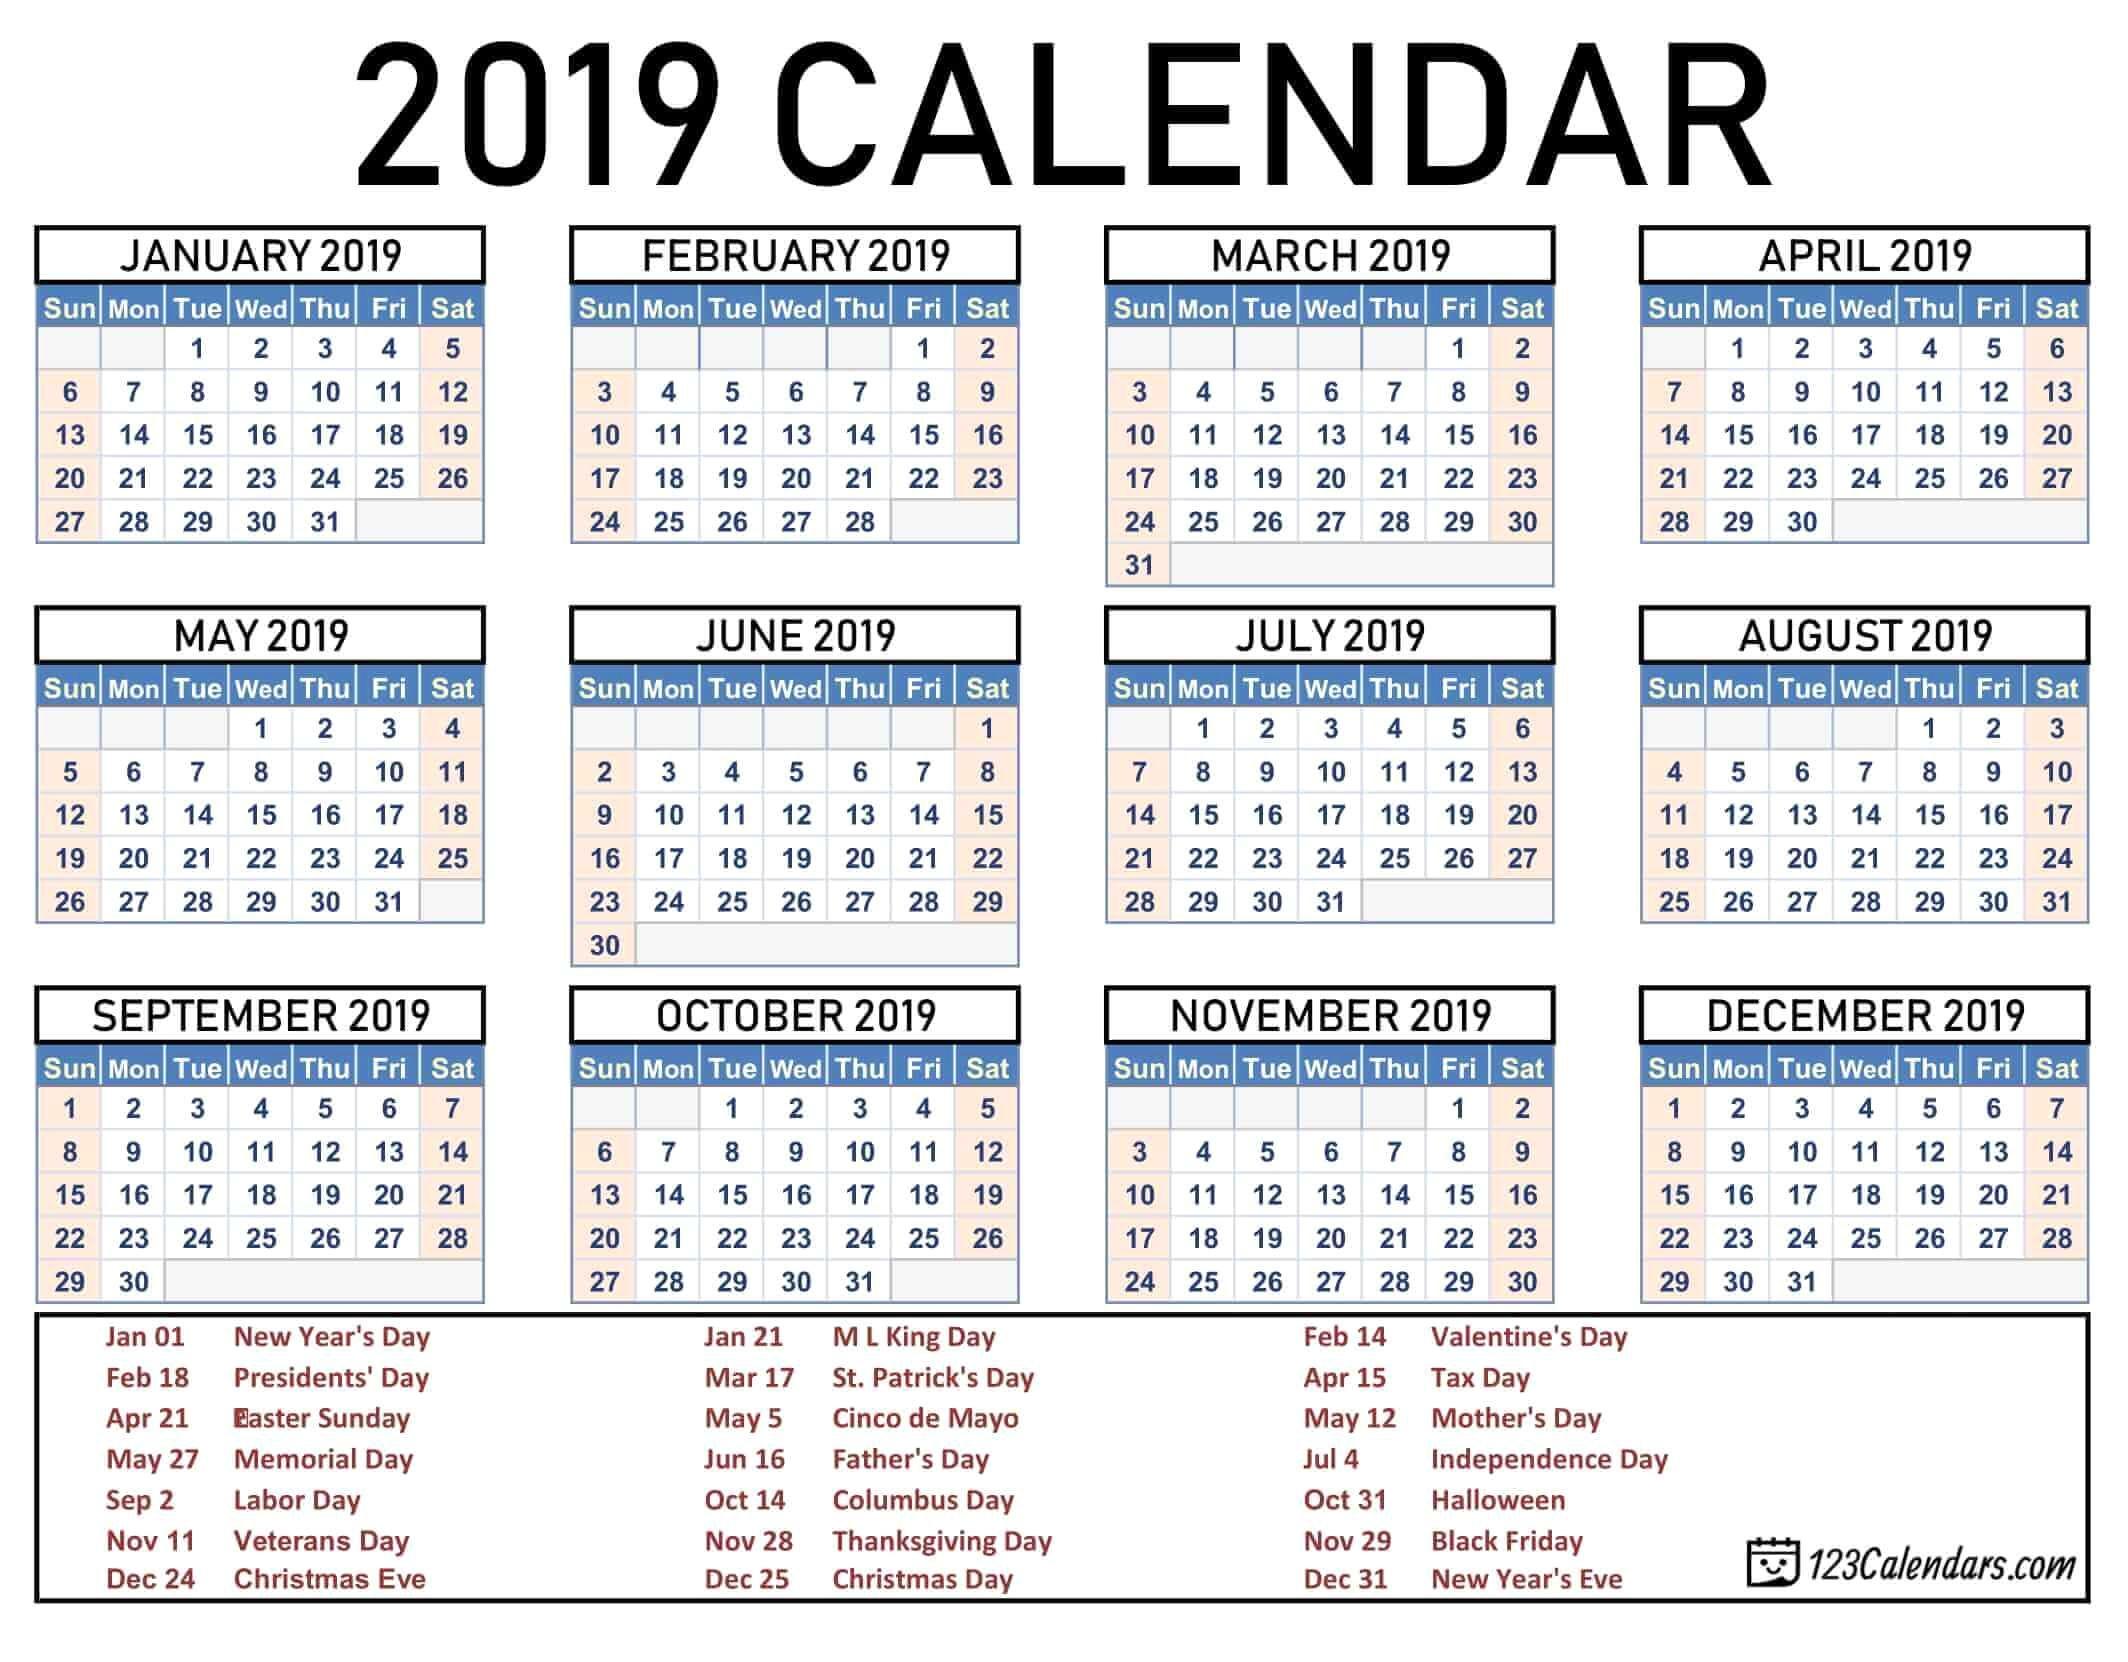 2019 2020 School Year Calendar Template Year 2019 Printable Calendar pertaining to 2019- 2020 Academic Calendar Printable Empty Boxes